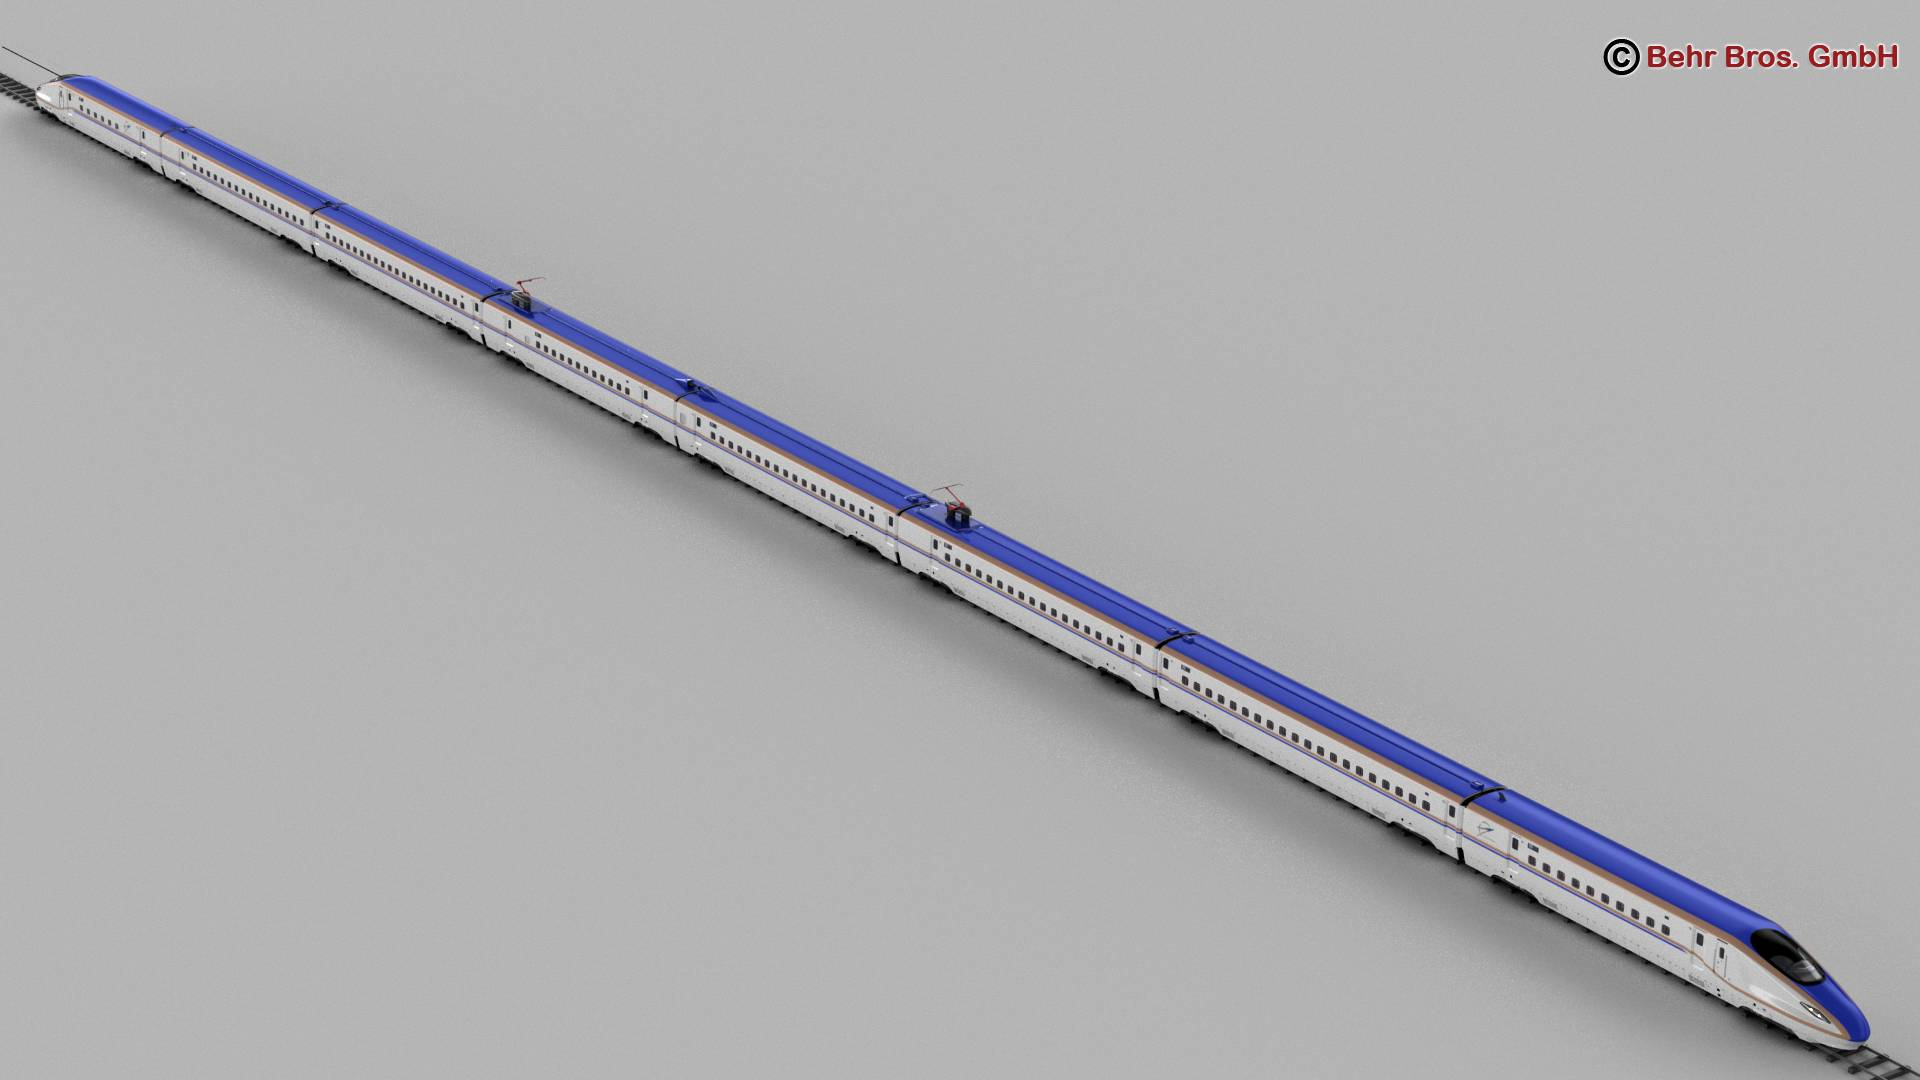 shinkansen e7 3d model 3ds max fbx c4d lwo ma mb obj 265655